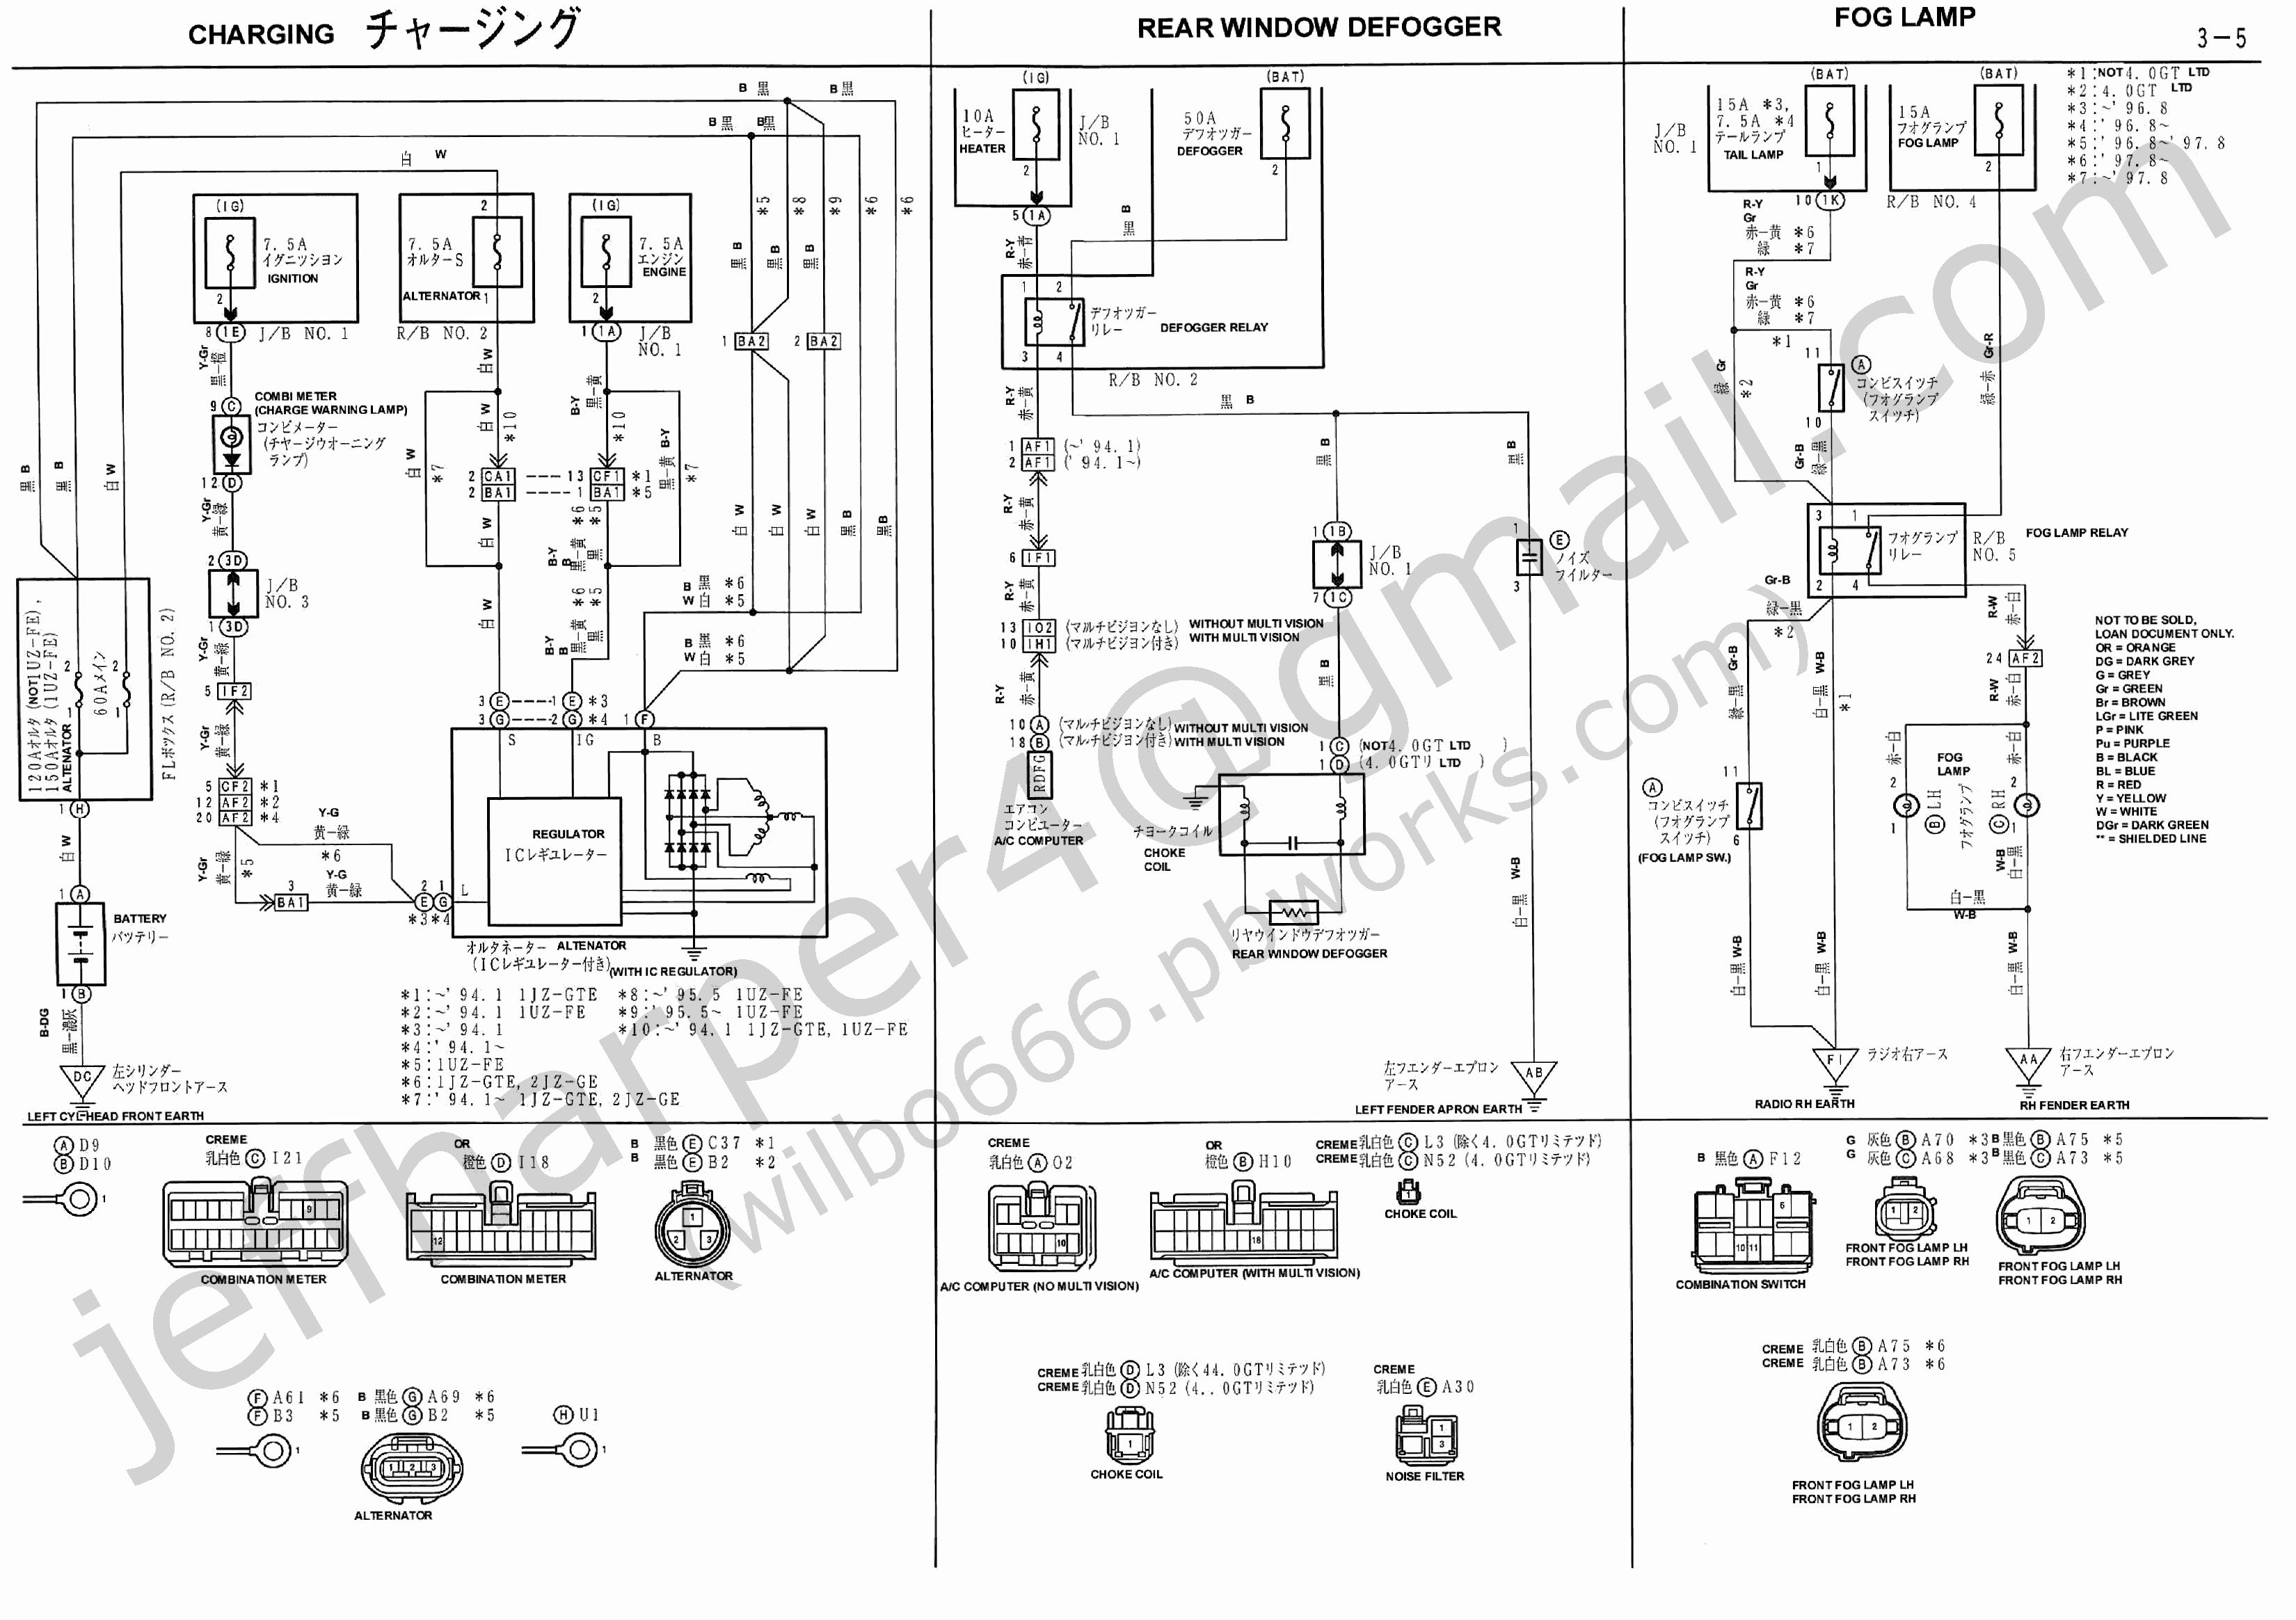 Lionel Postwar Wiring Diagrams Wiring Diagram